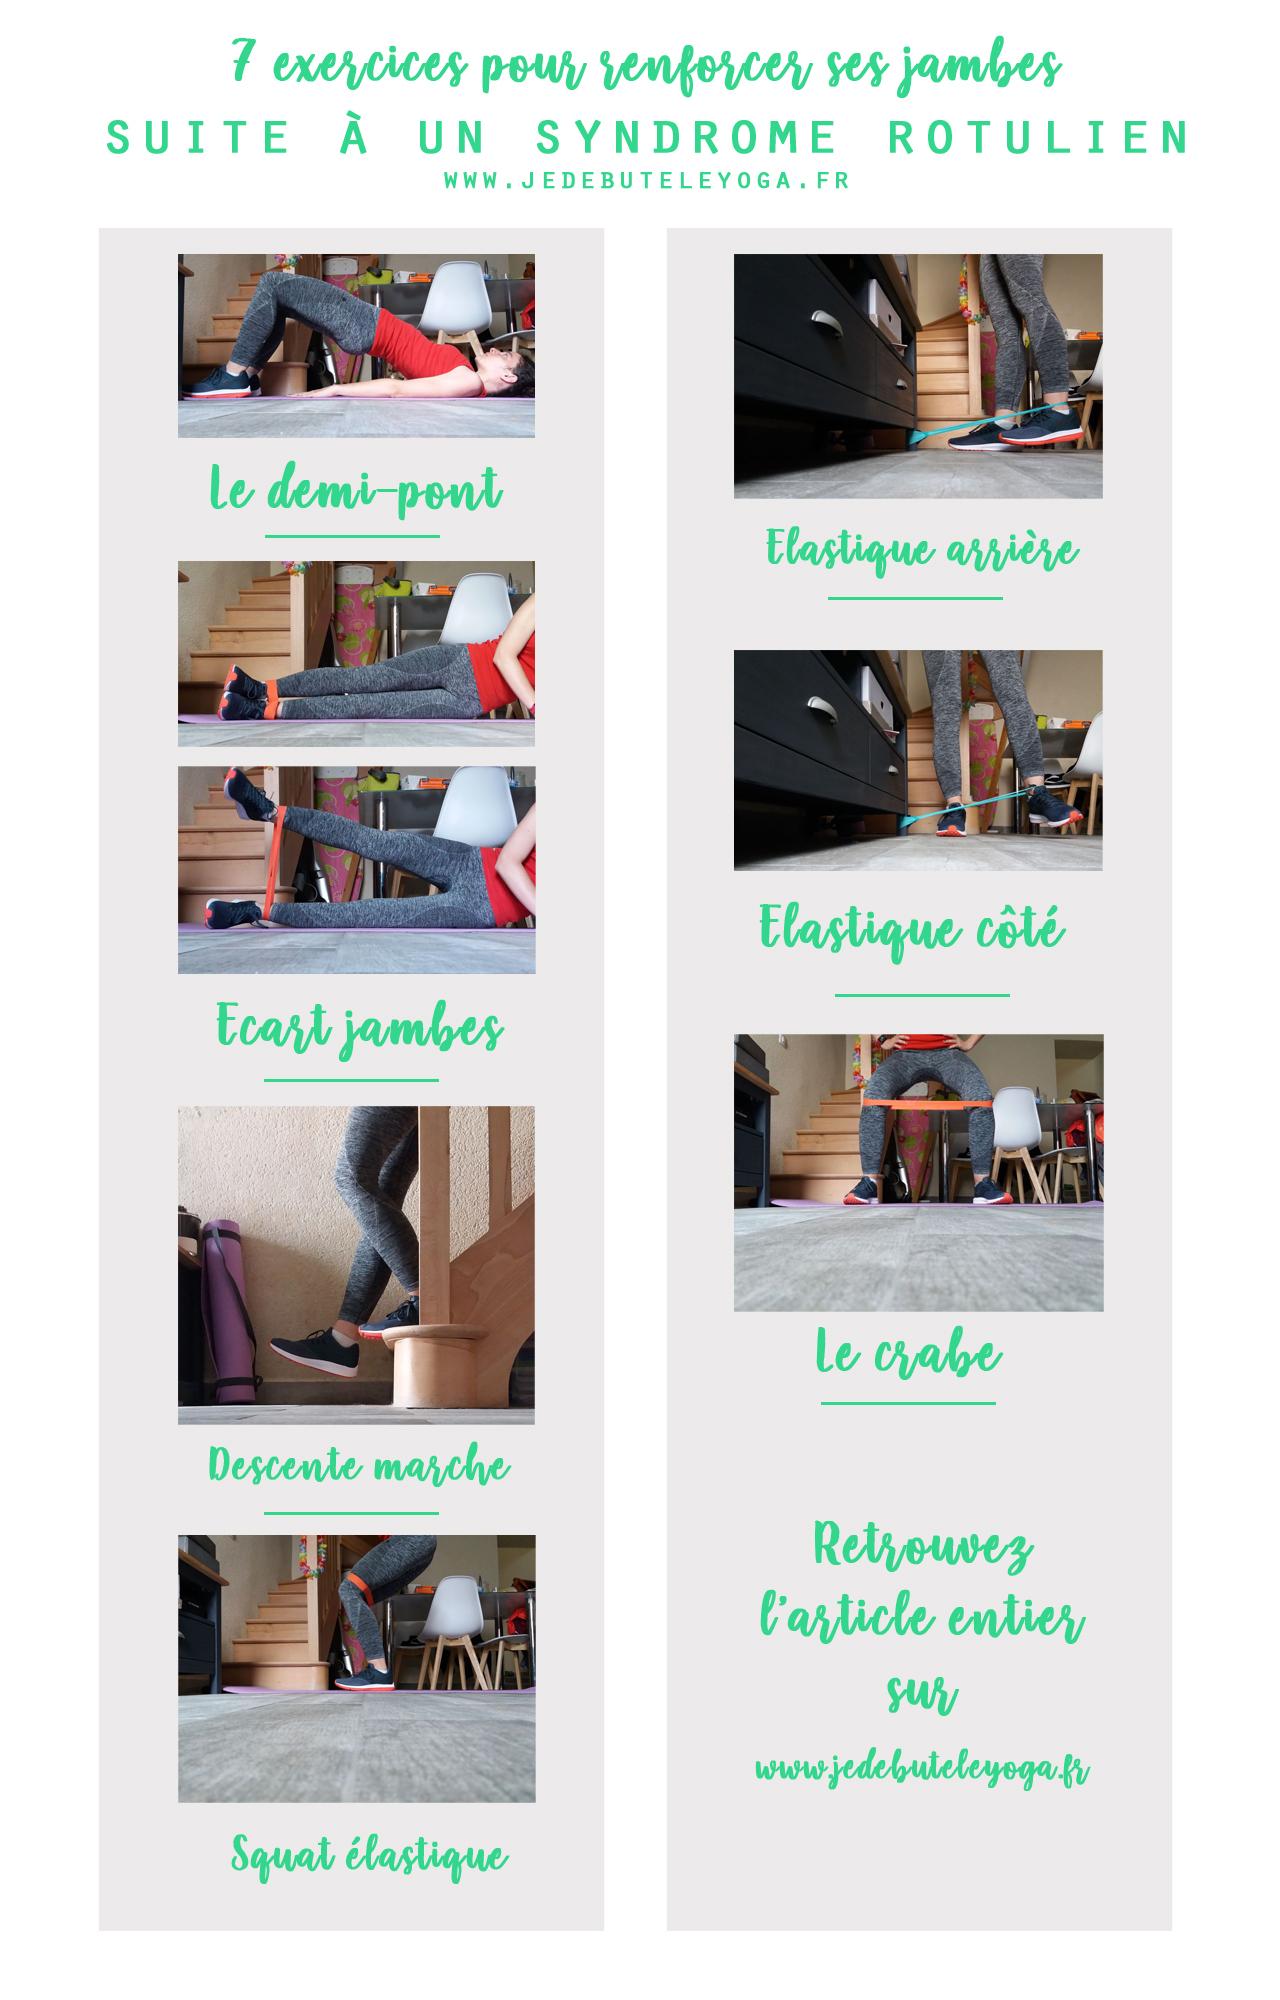 infographie renforcement des jambes